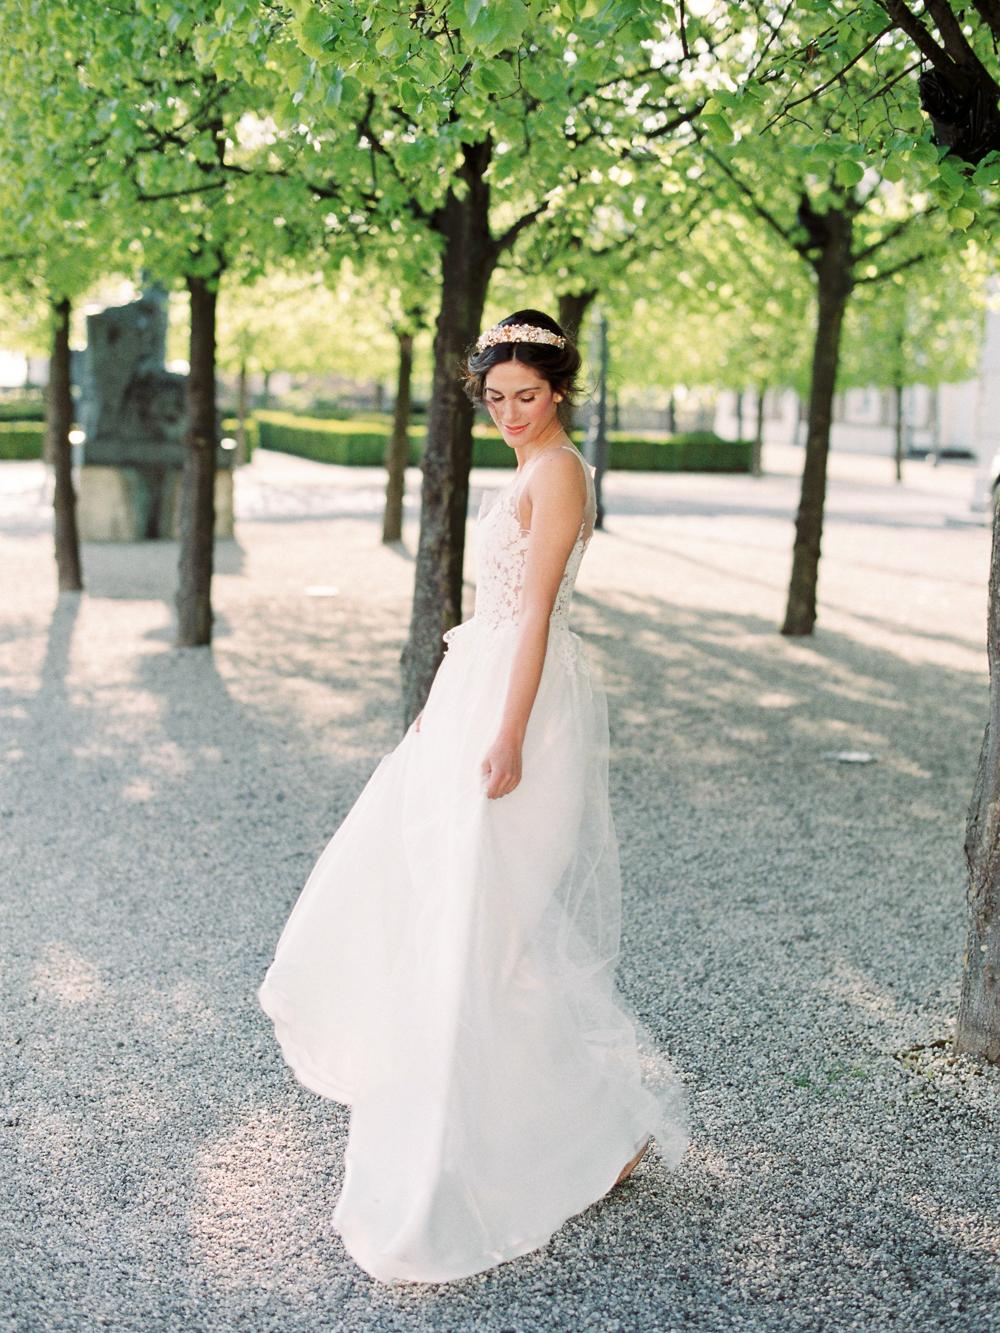 bride getting married in germany wedding castle in germany wedding venue germany dusty blue color palette velvet themed wedding